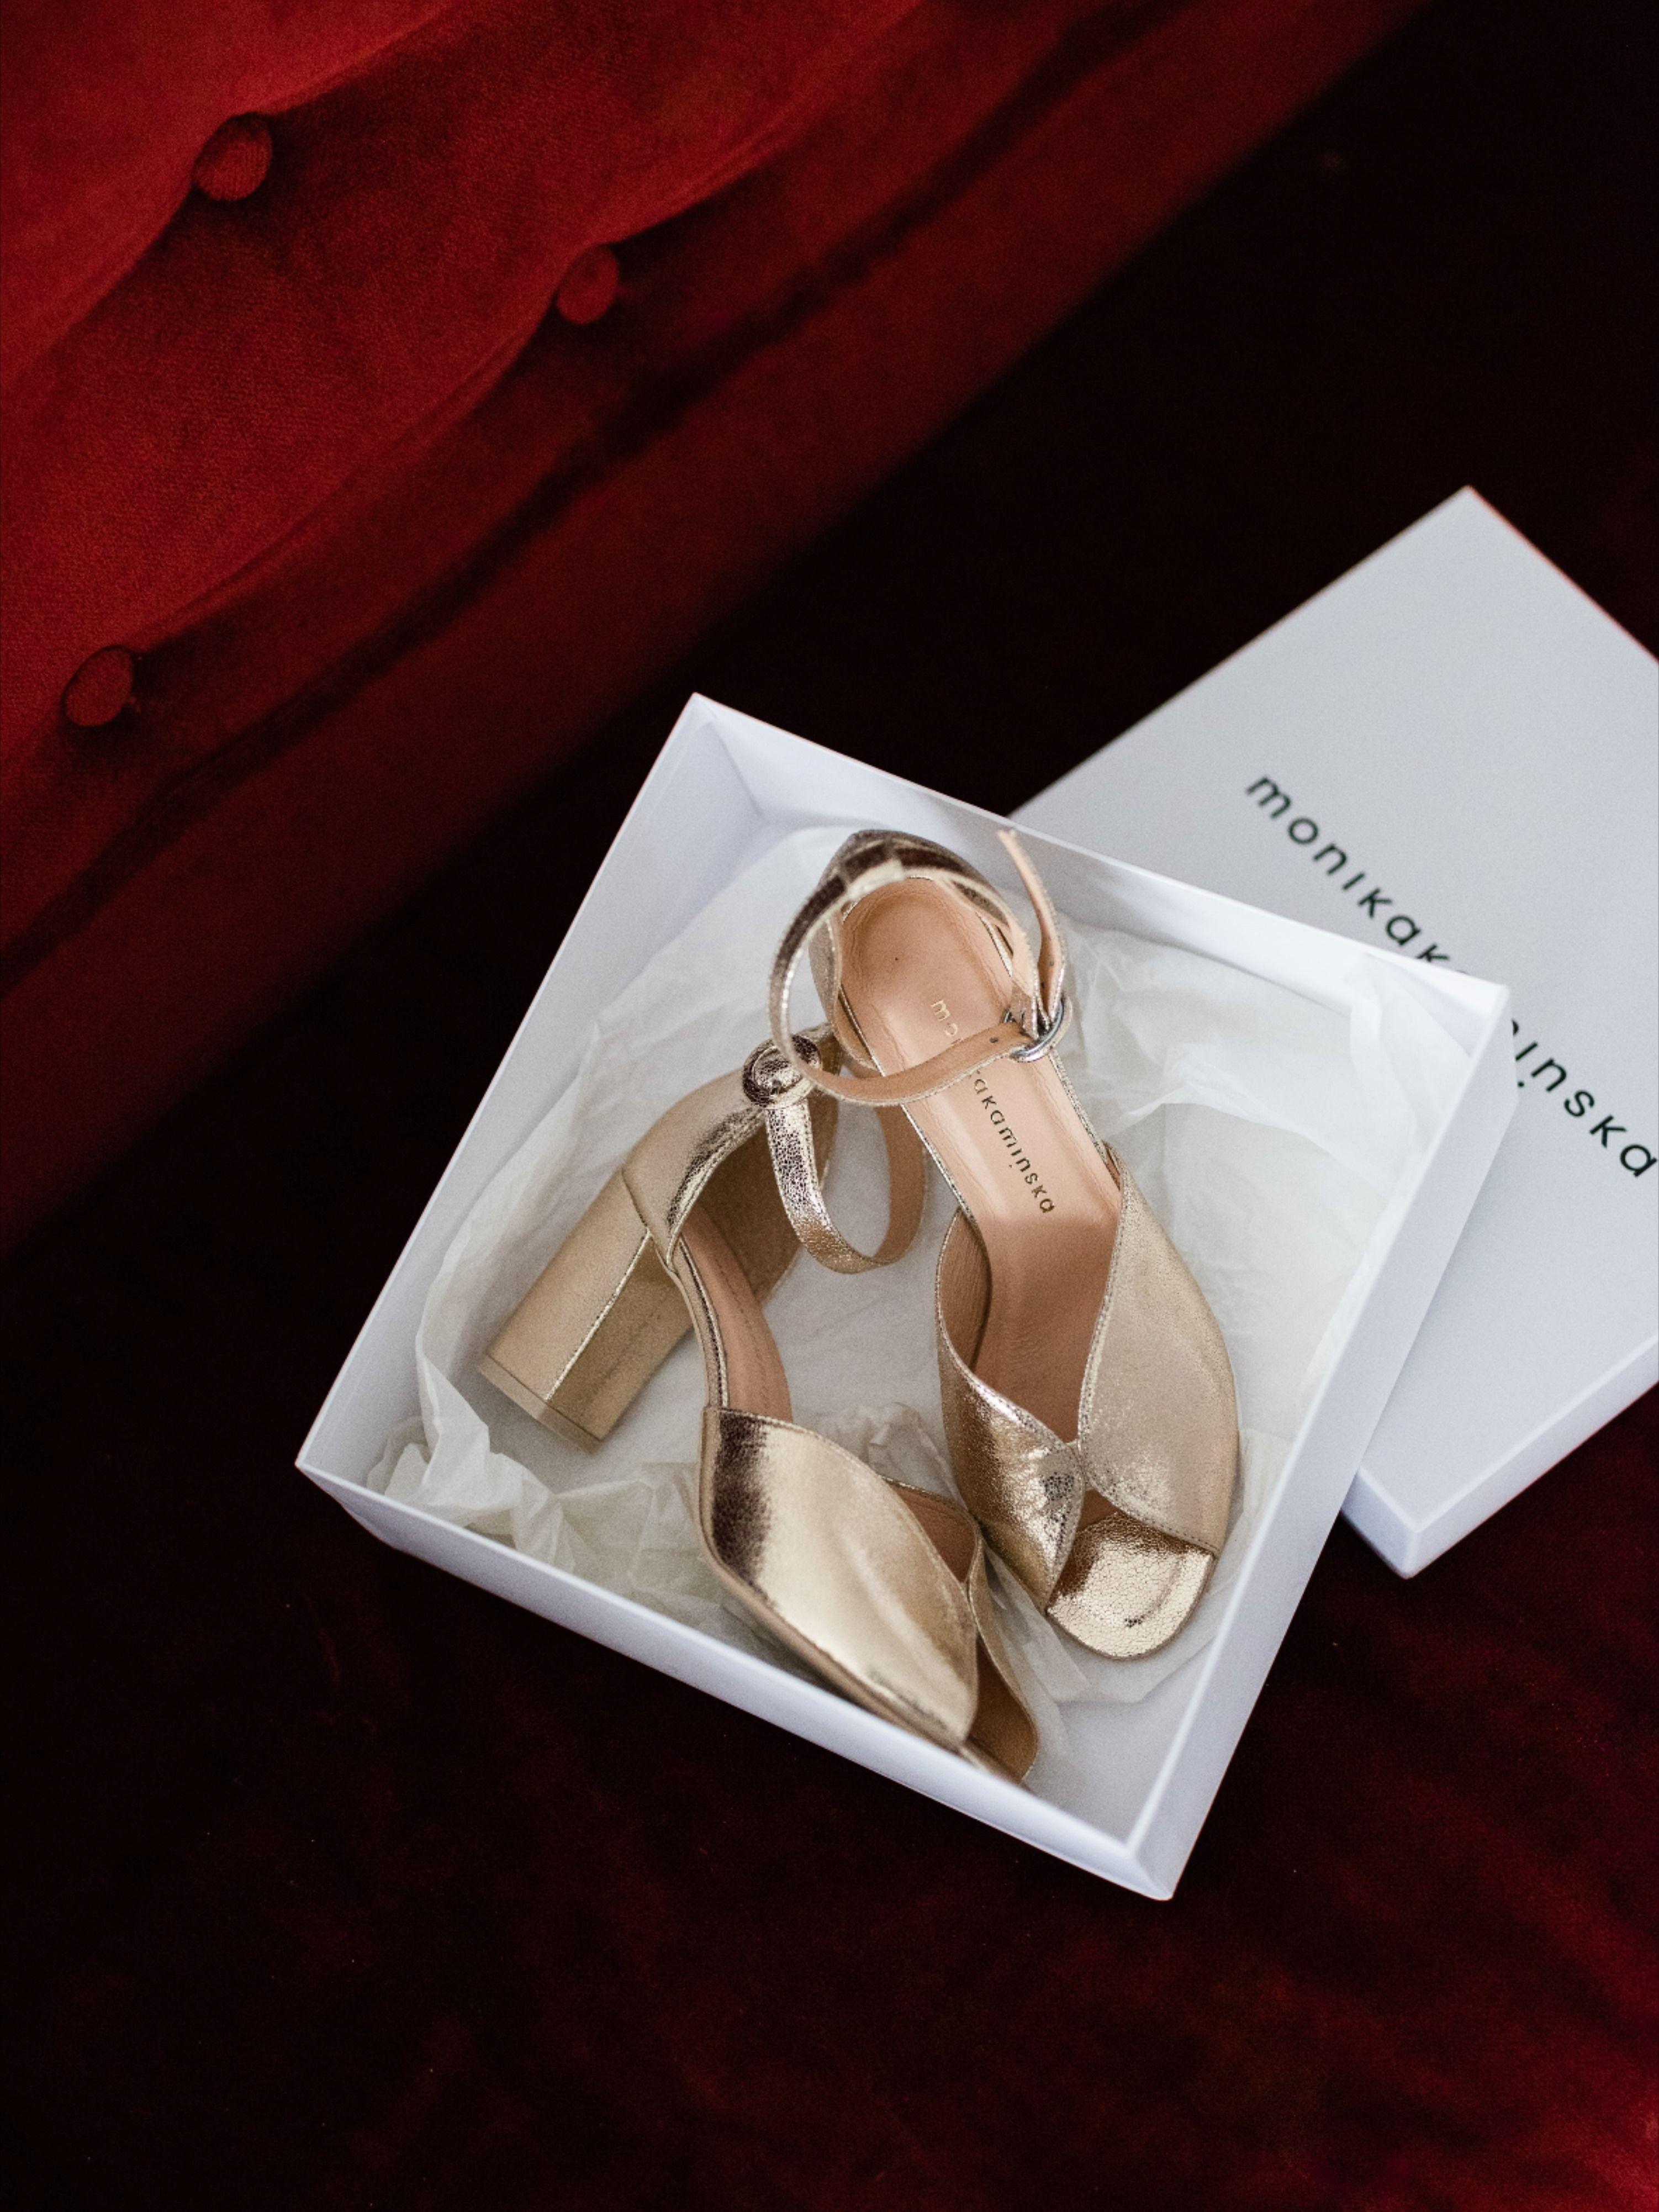 Buty Slubne Na Zamowienie Shoes Sport Shoes Dance Shoes